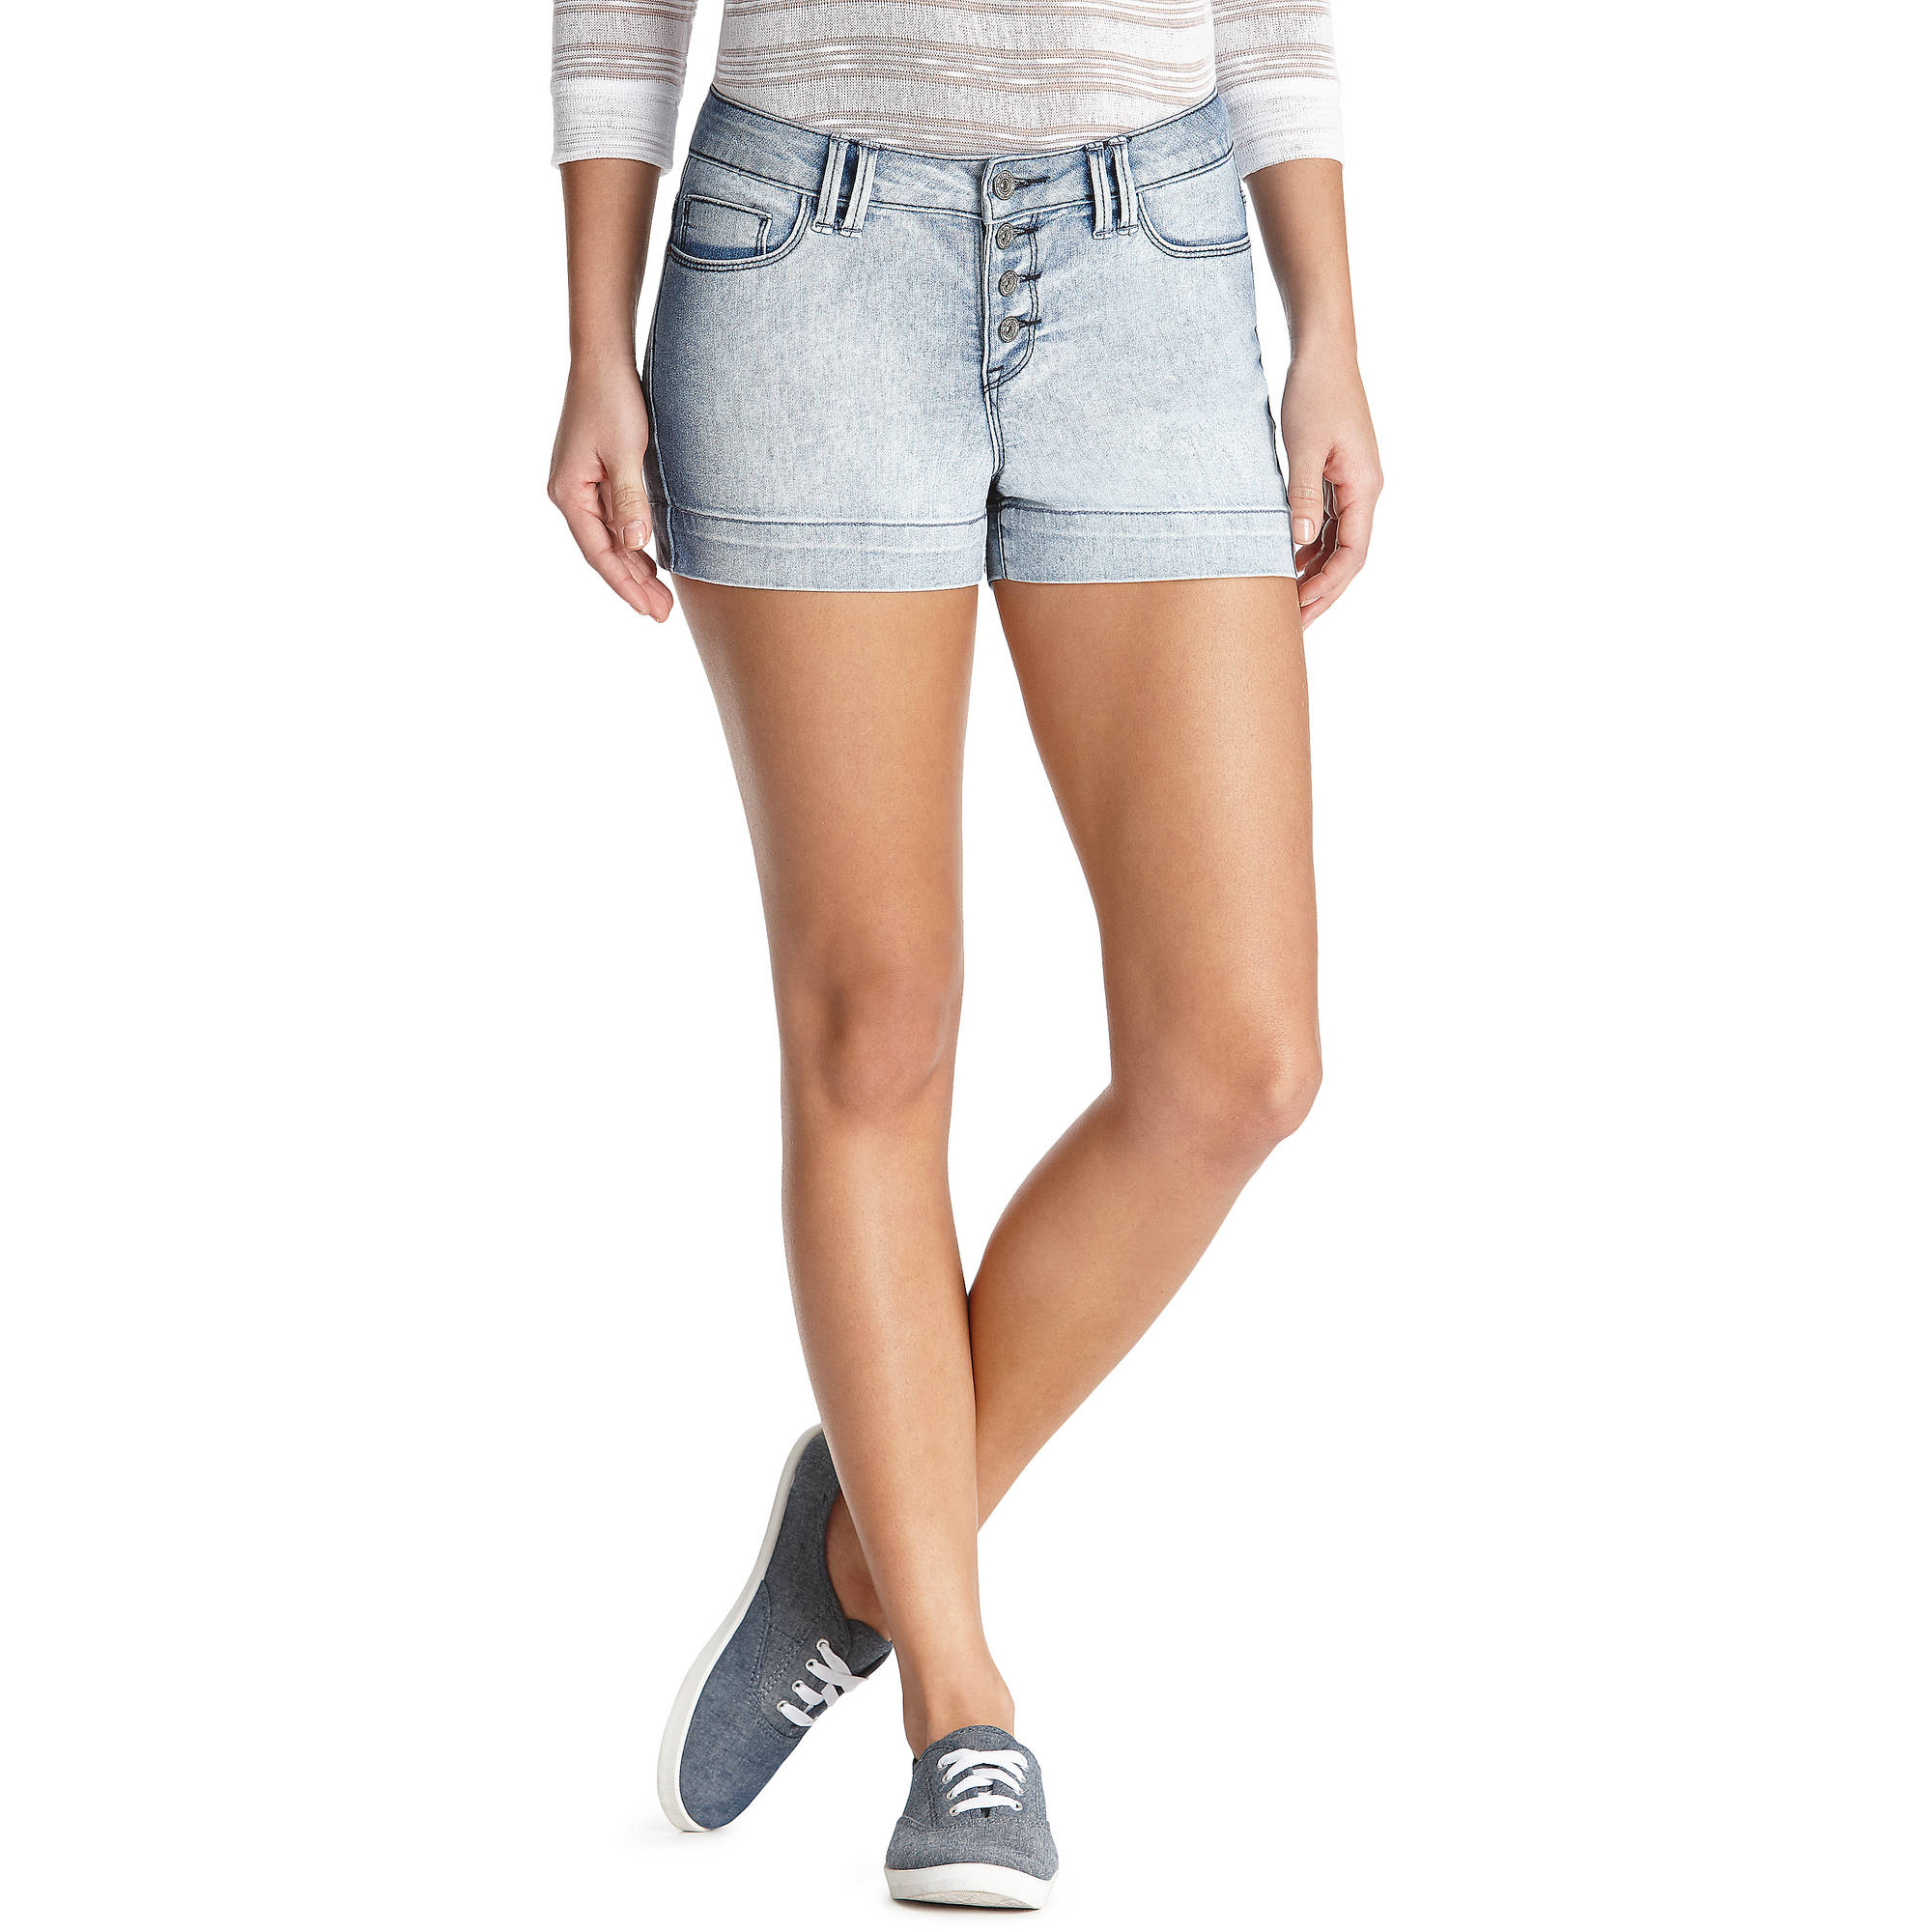 L.E.I. Juniors' High Waisted Shorts - Walmart.com